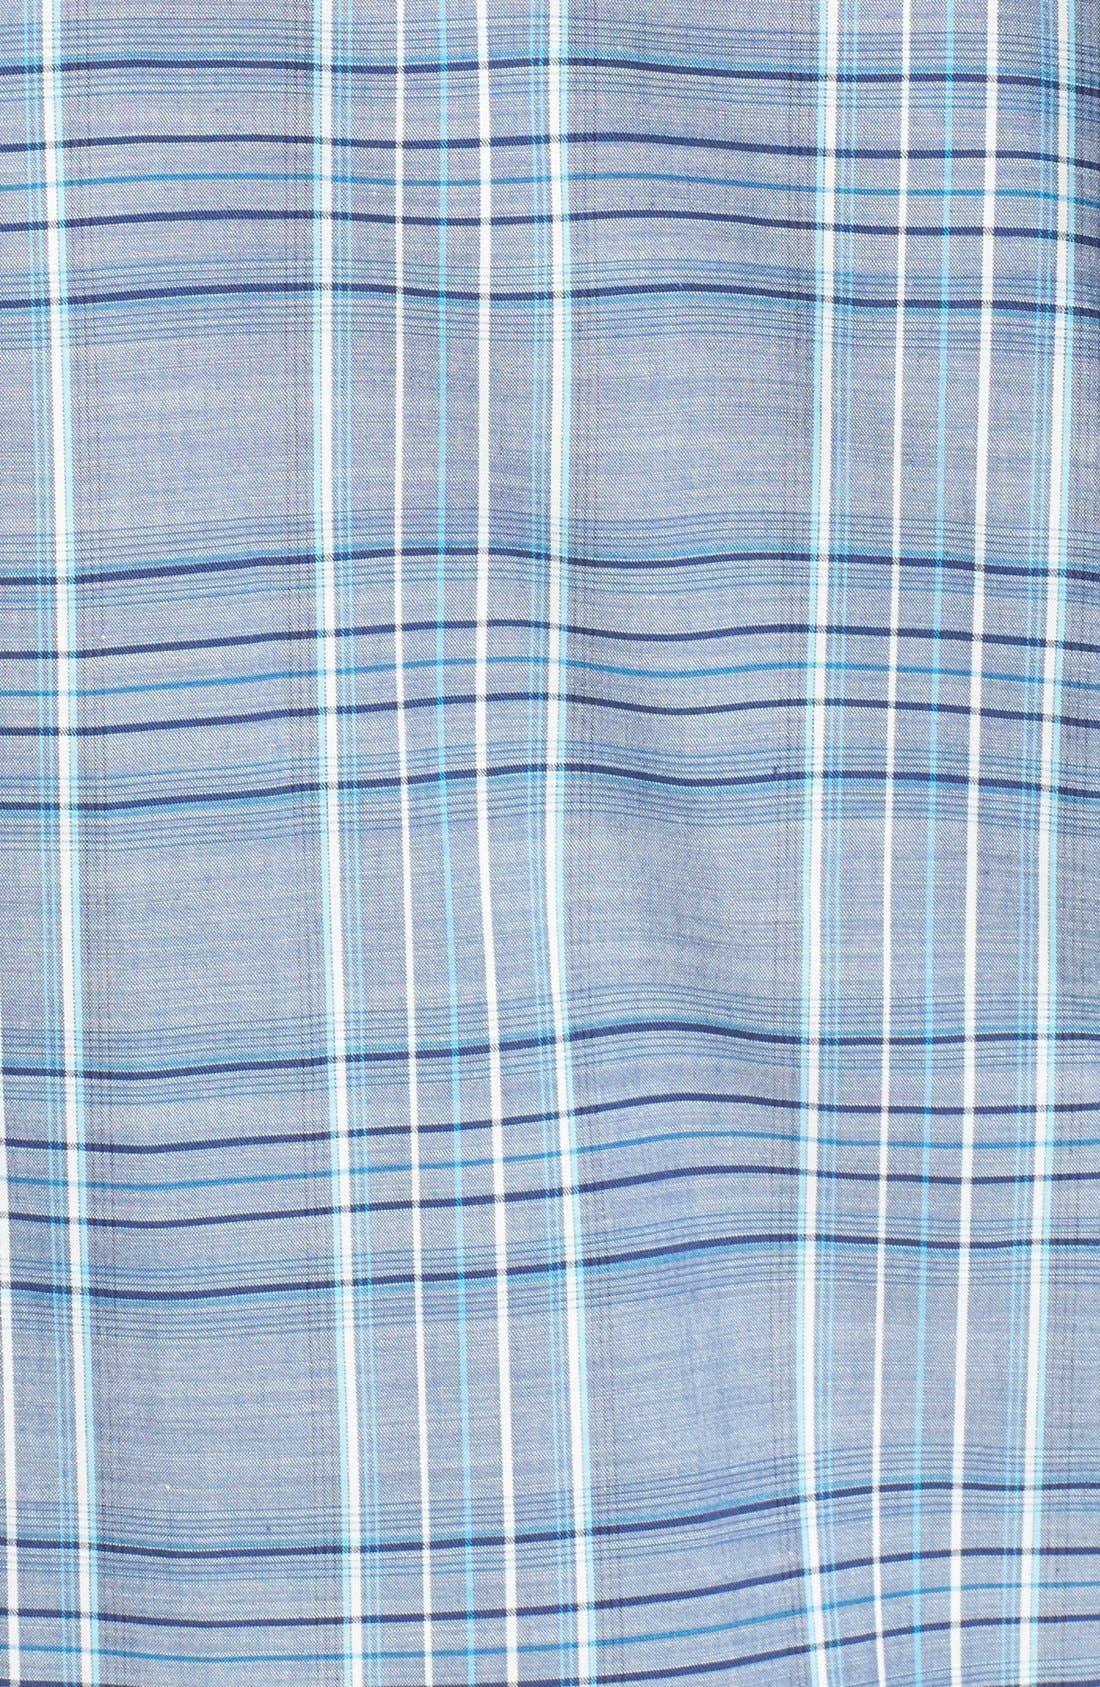 Alternate Image 3  - Zachary Prell 'Deeb' Standard Fit Short Sleeve Windowpane Plaid Sport Shirt